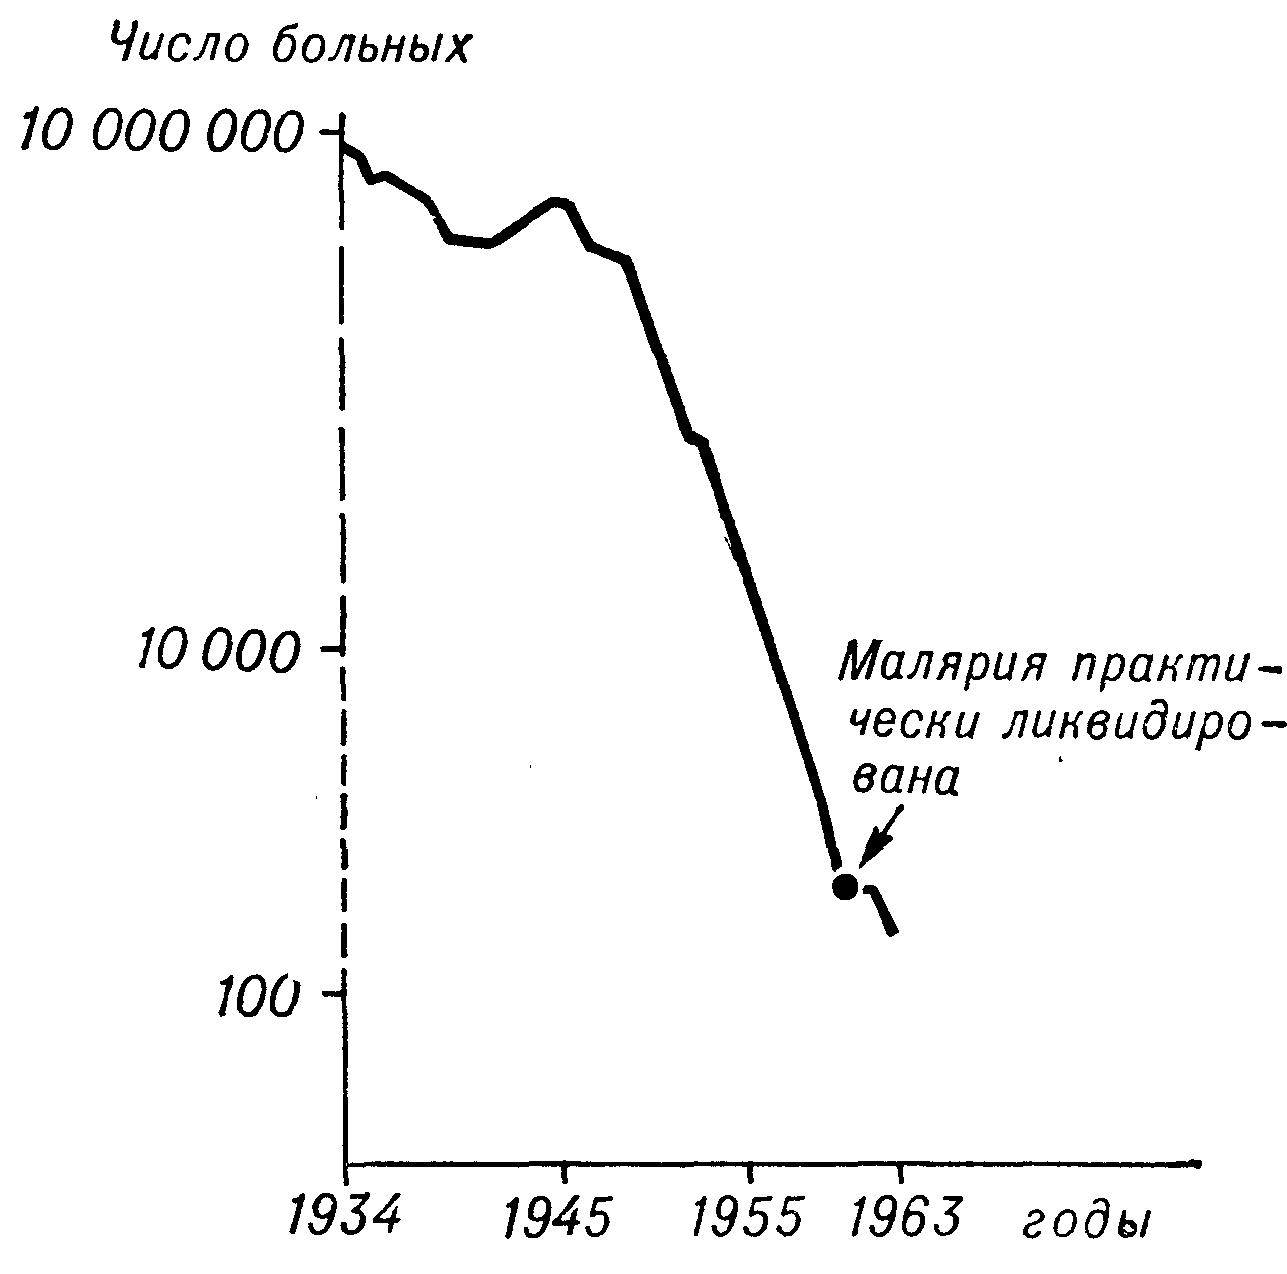 Рис. 2. Кривая, характеризующая ход ликвидации малярии в СССР с 1934 по 1963 гг.